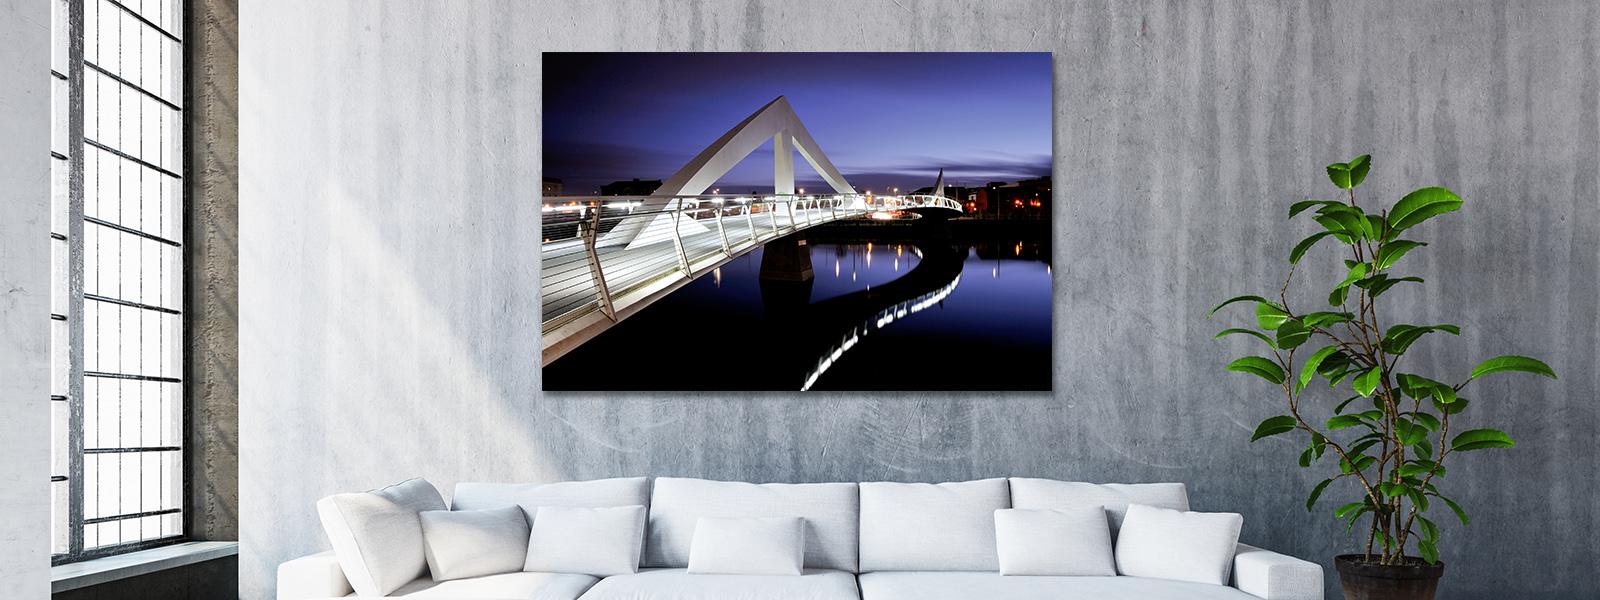 Photo of Squiggly Bridge Dusk on wall